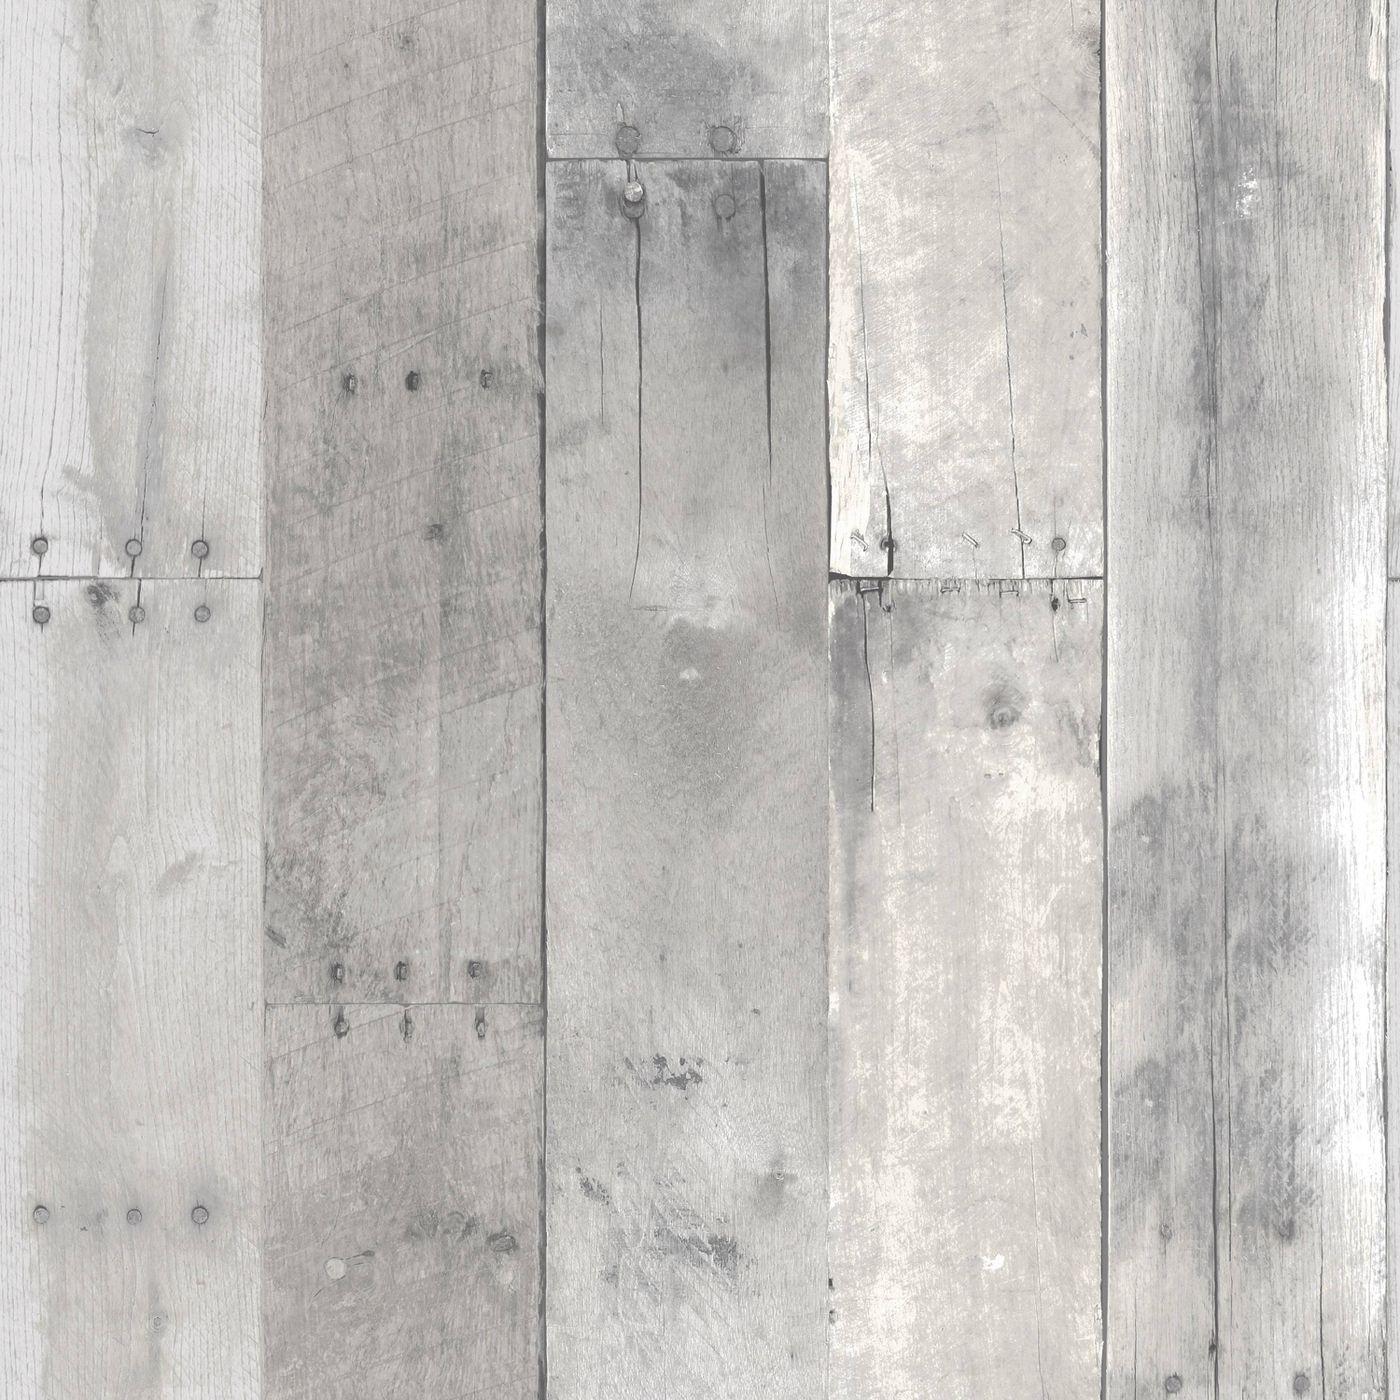 Reclaimed Wood Peel Stick Wallpaper Threshold In 2021 Peel And Stick Wallpaper Reclaimed Wood Wallpaper Reclaimed Wood